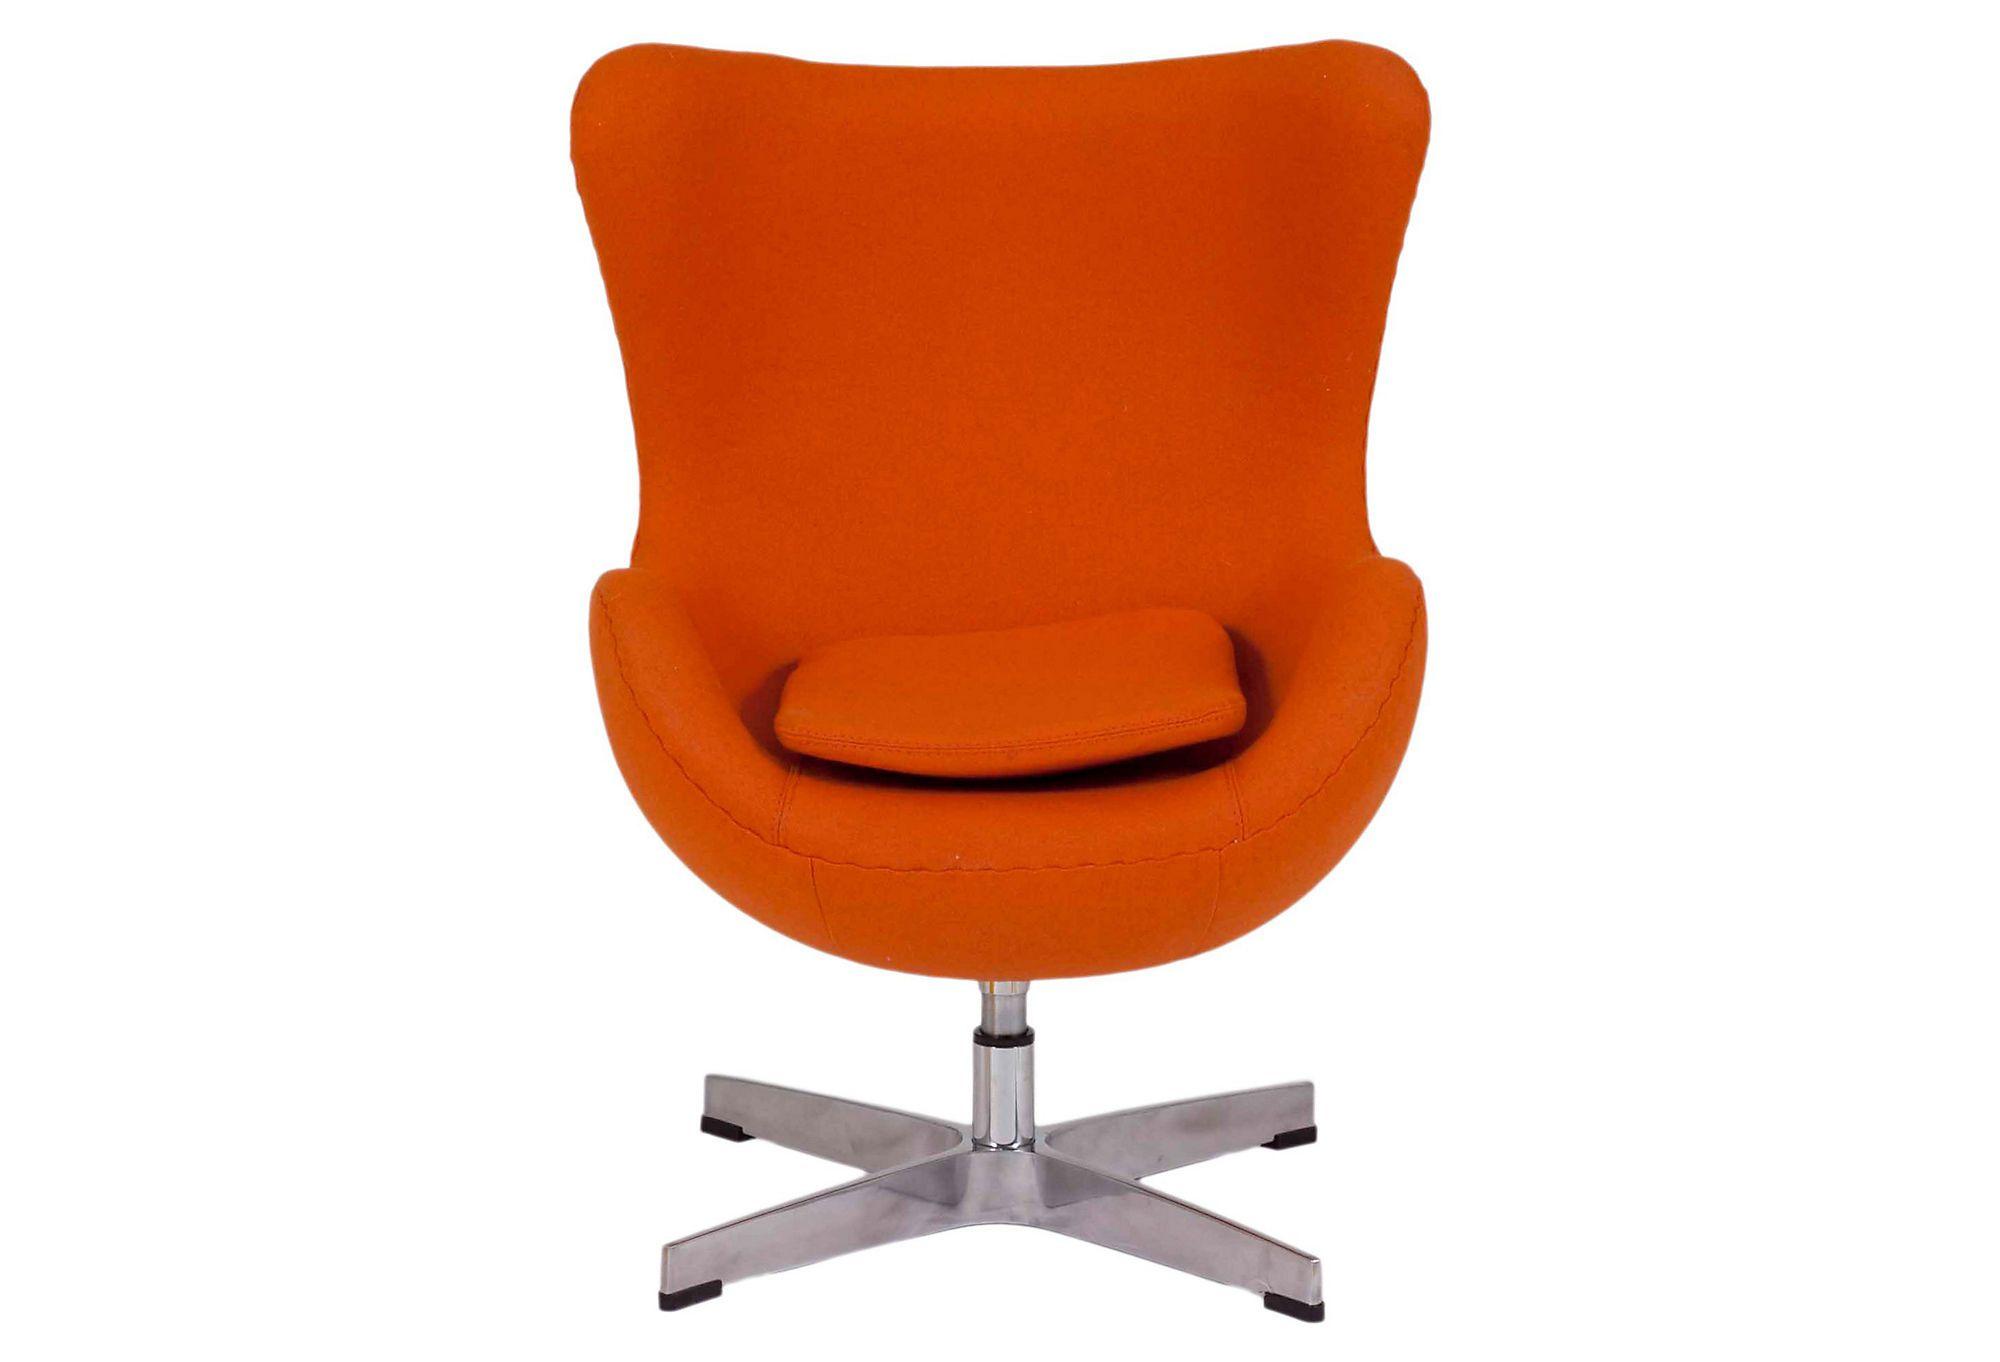 Jetson Swivel Chair, Orange #Chair #KidsBaby #Home #BedBathFurniture